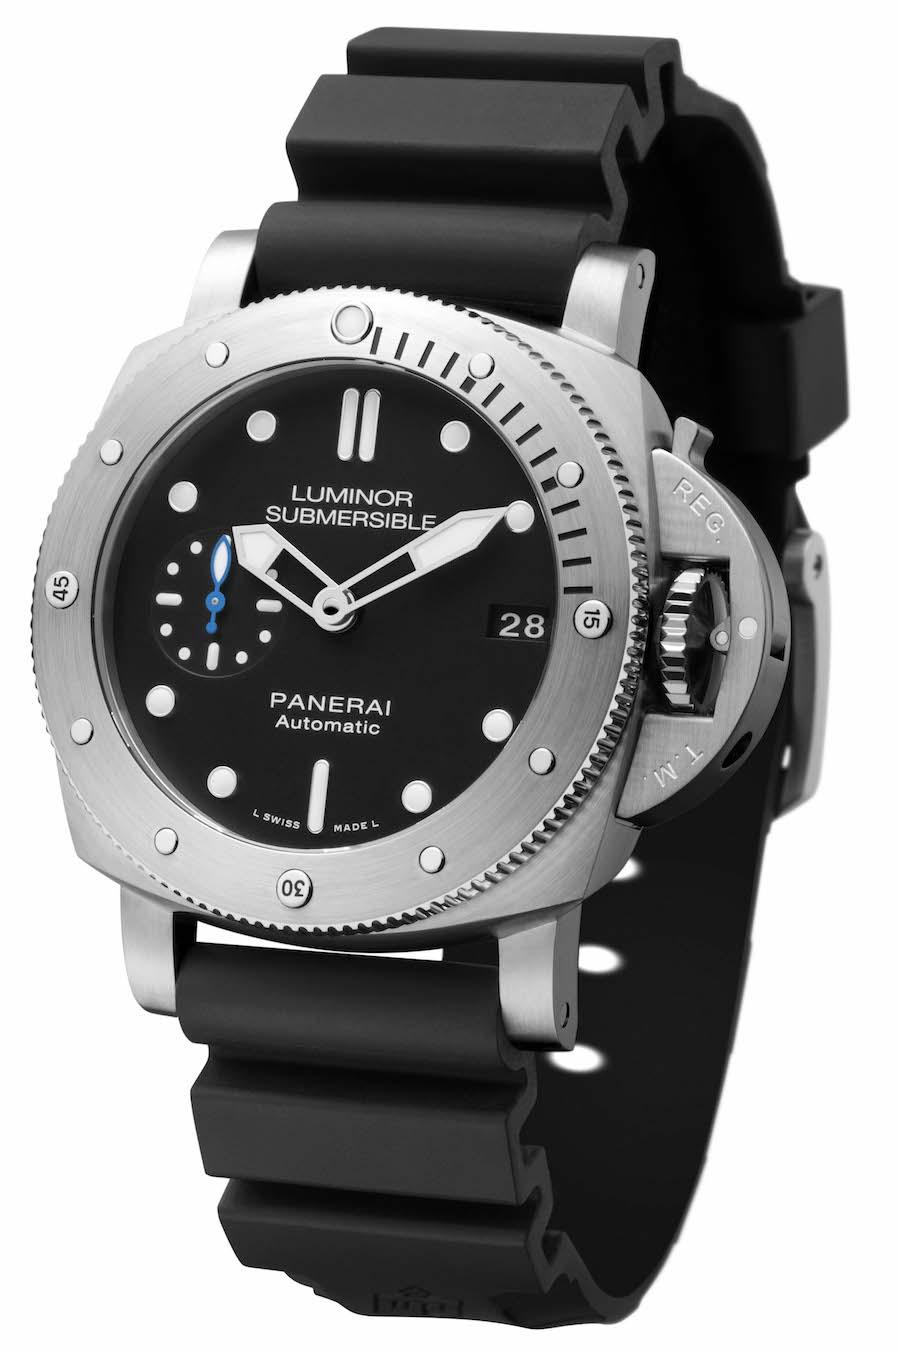 panerai-karora-luxusora-svajci-ora-pam00682_3-4.jpg